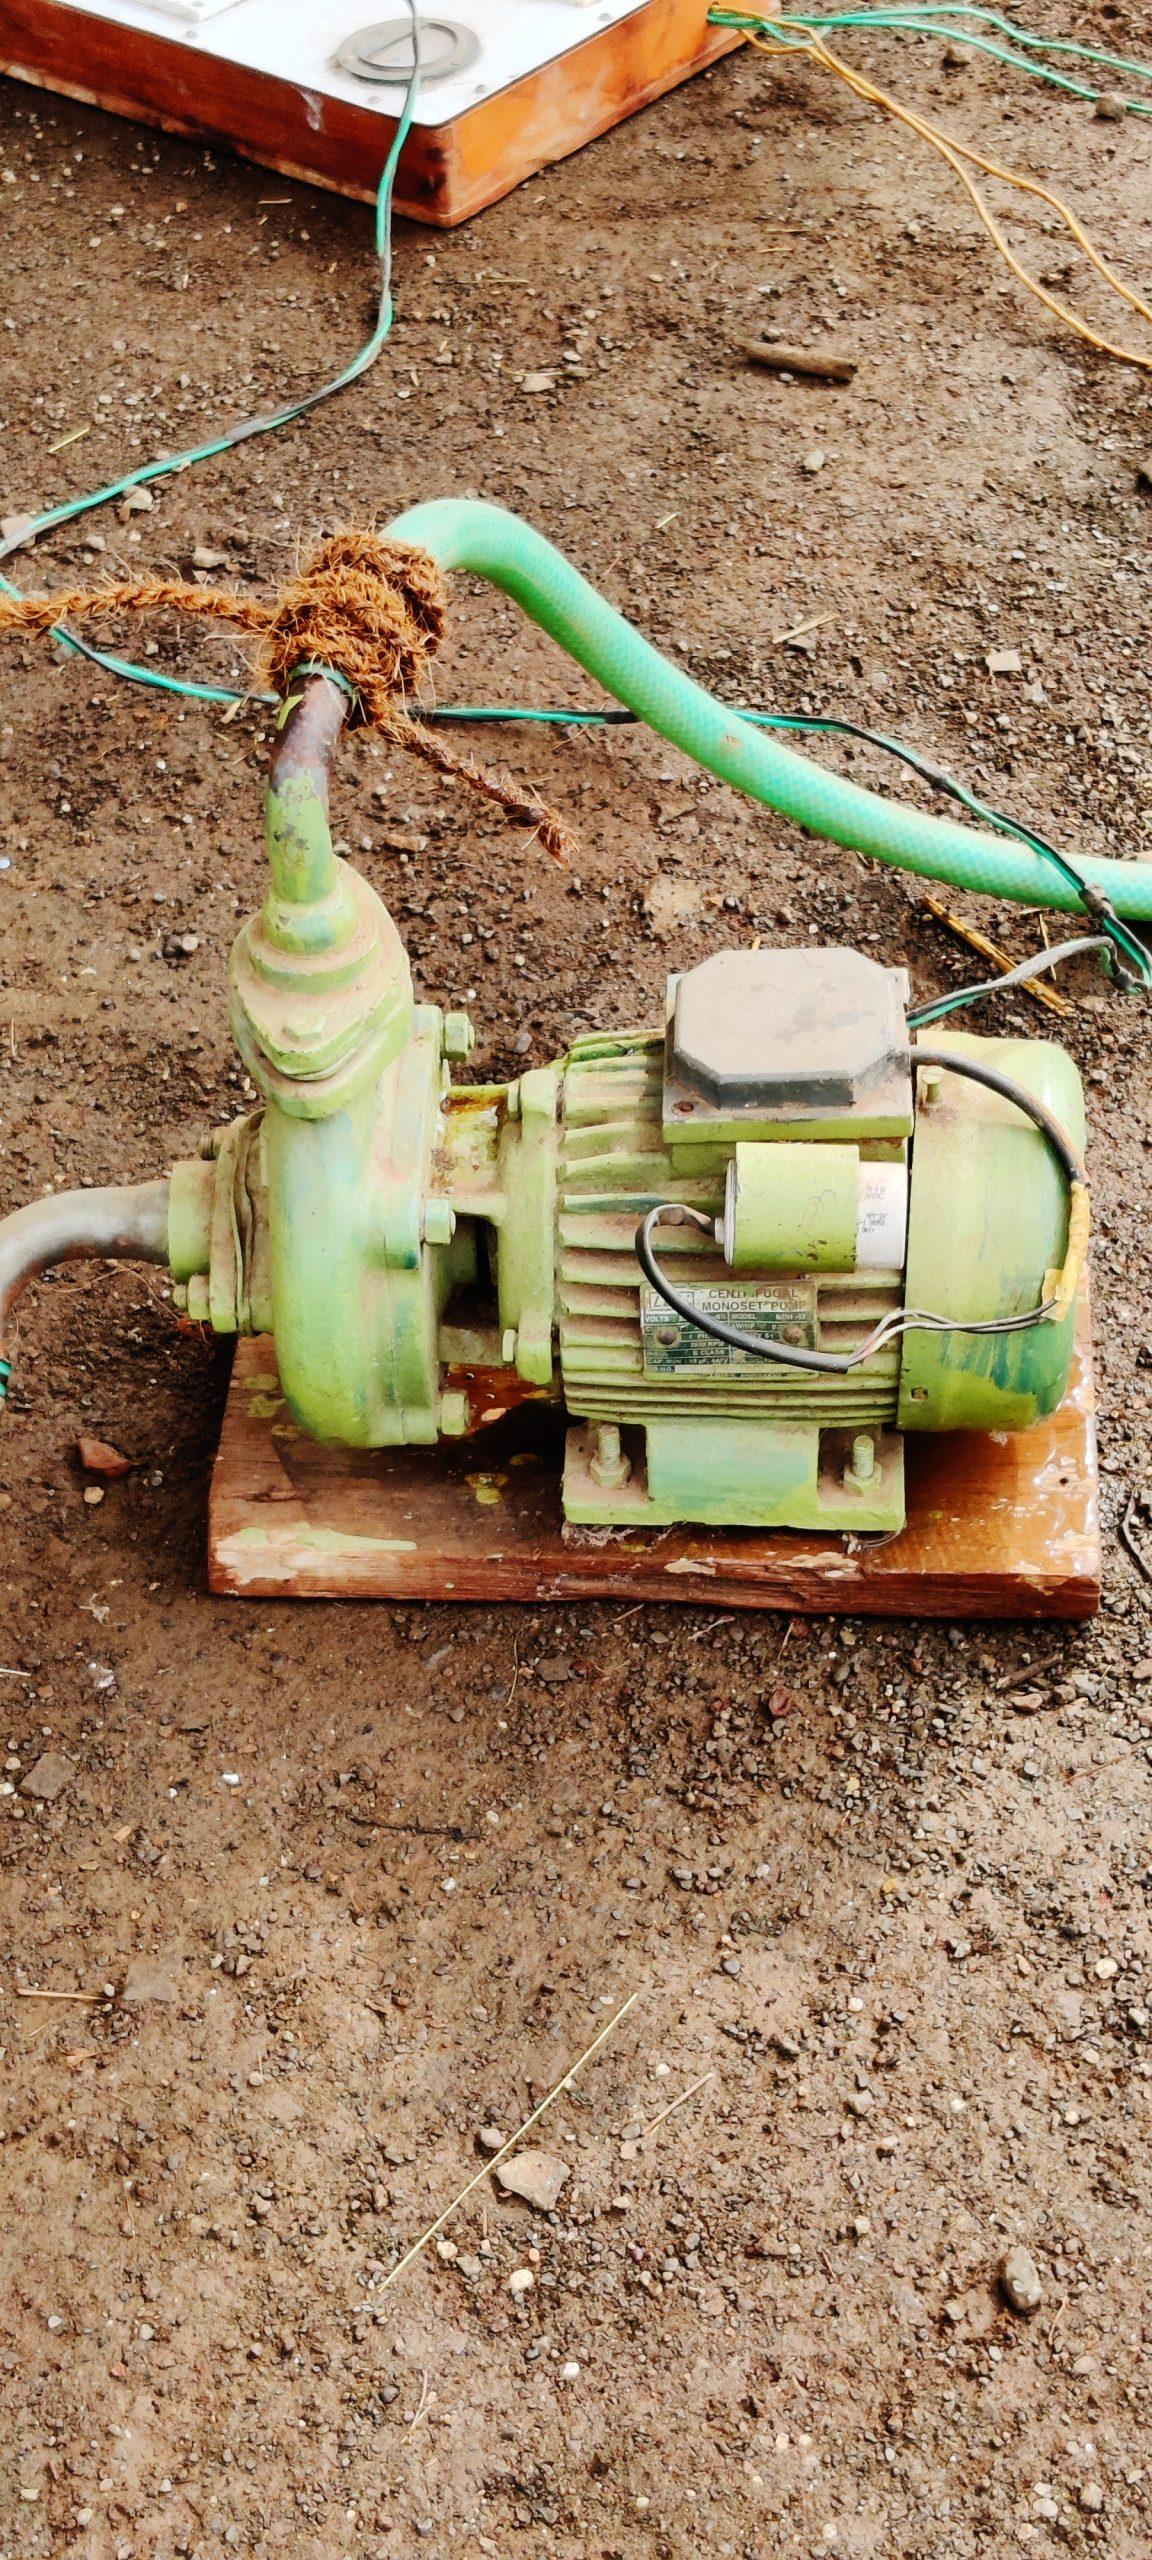 A motor pump